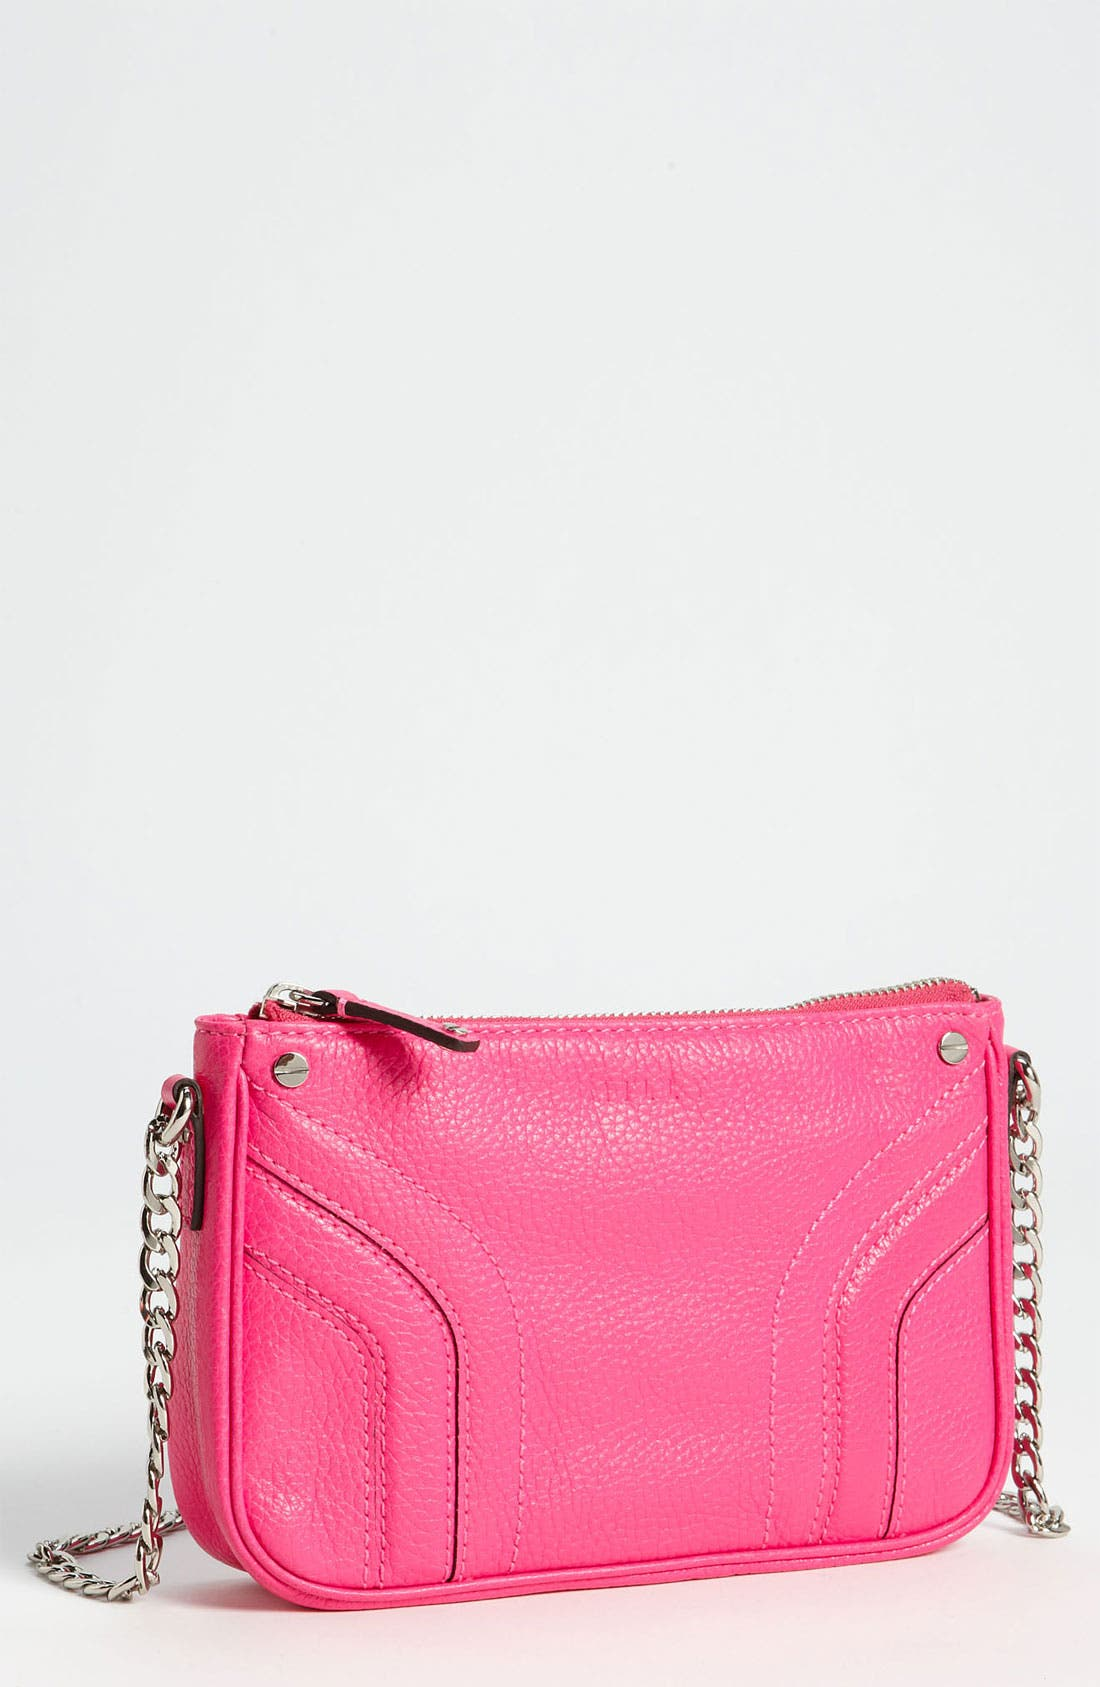 Main Image - Milly 'Zoey' Crossbody Bag